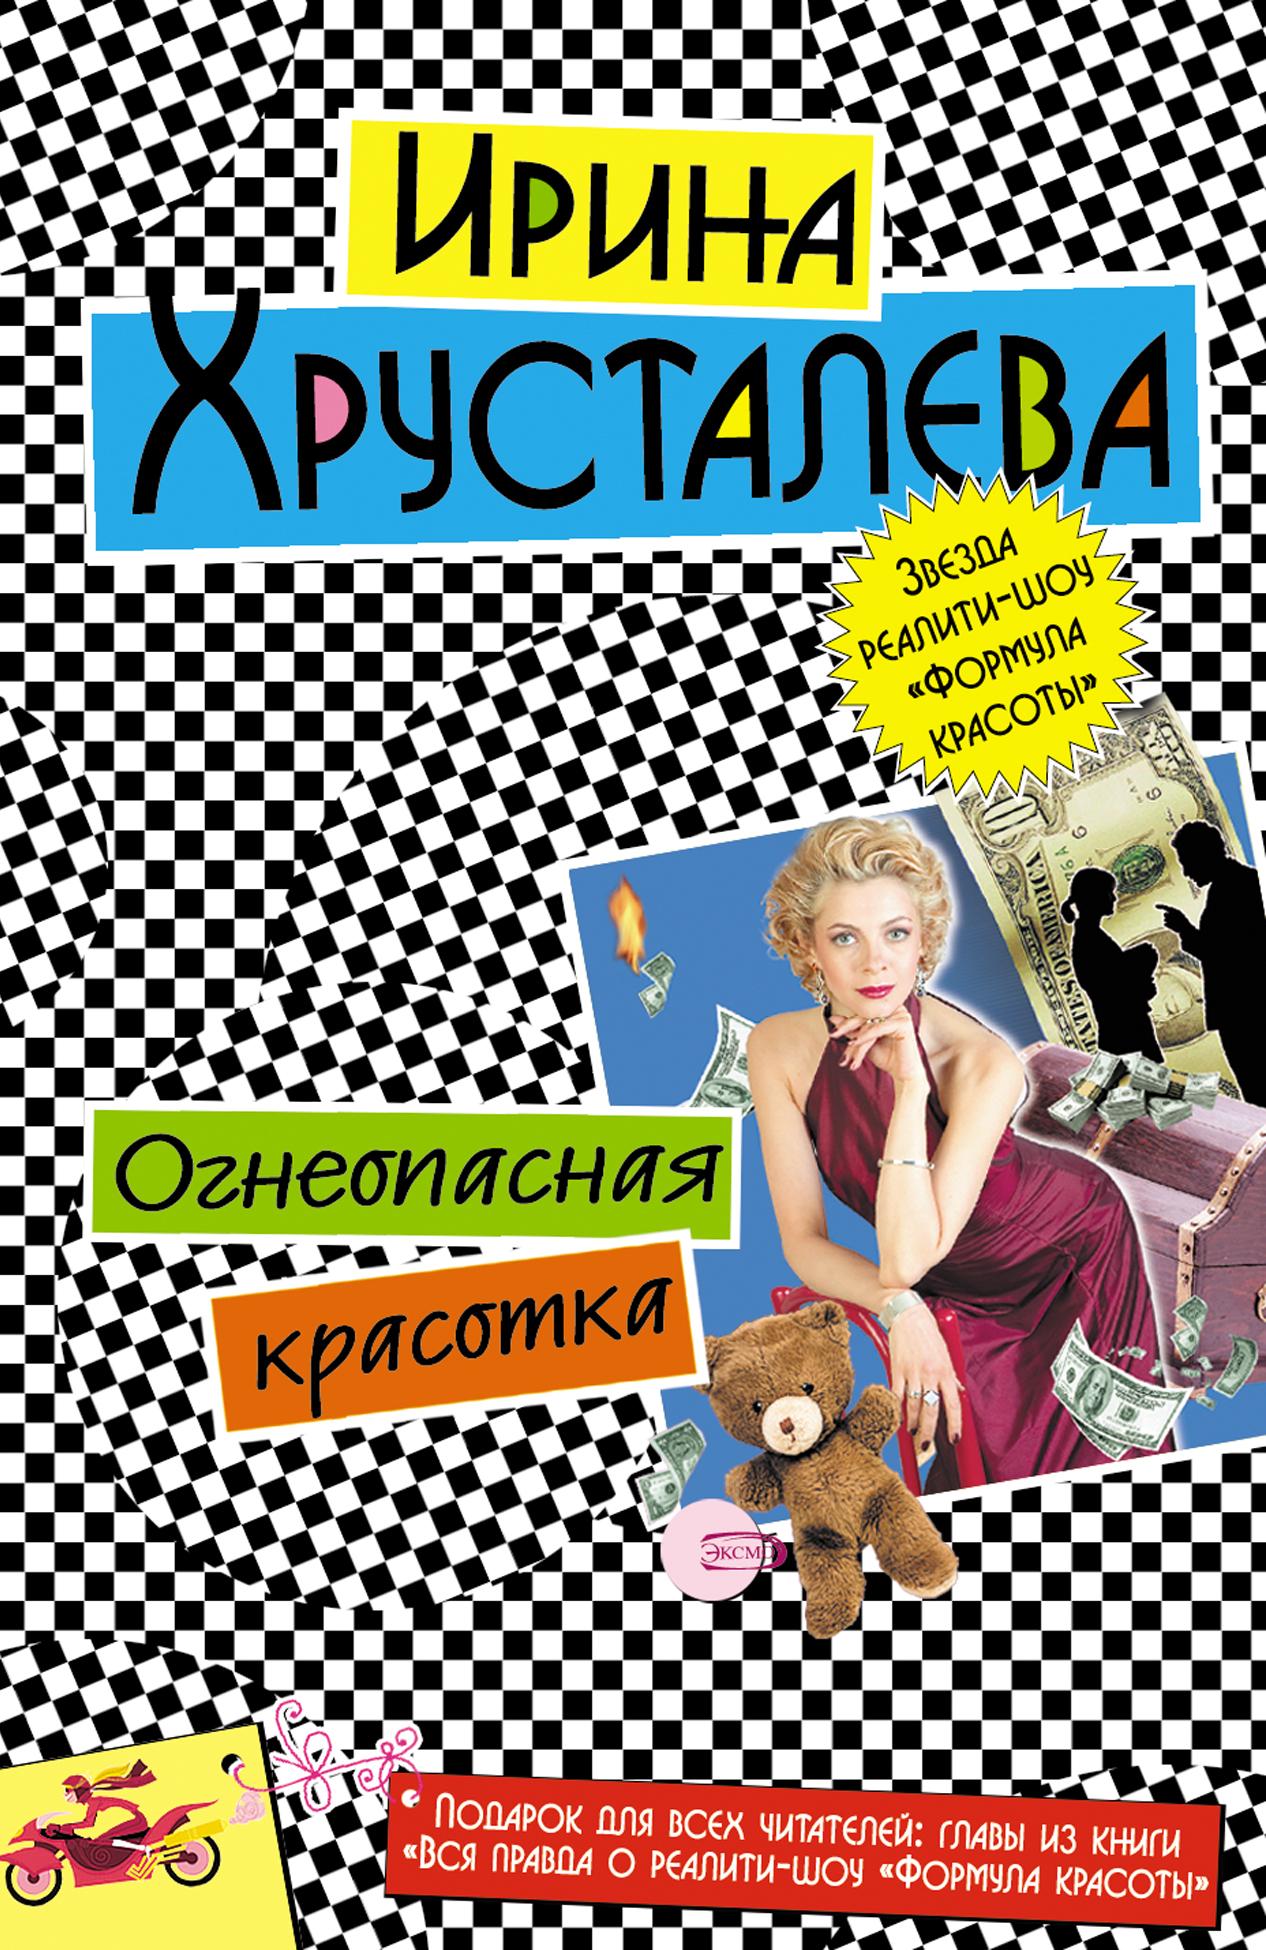 Ирина Хрусталева Огнеопасная красотка правдина н ред правдина isbn 9785912071805